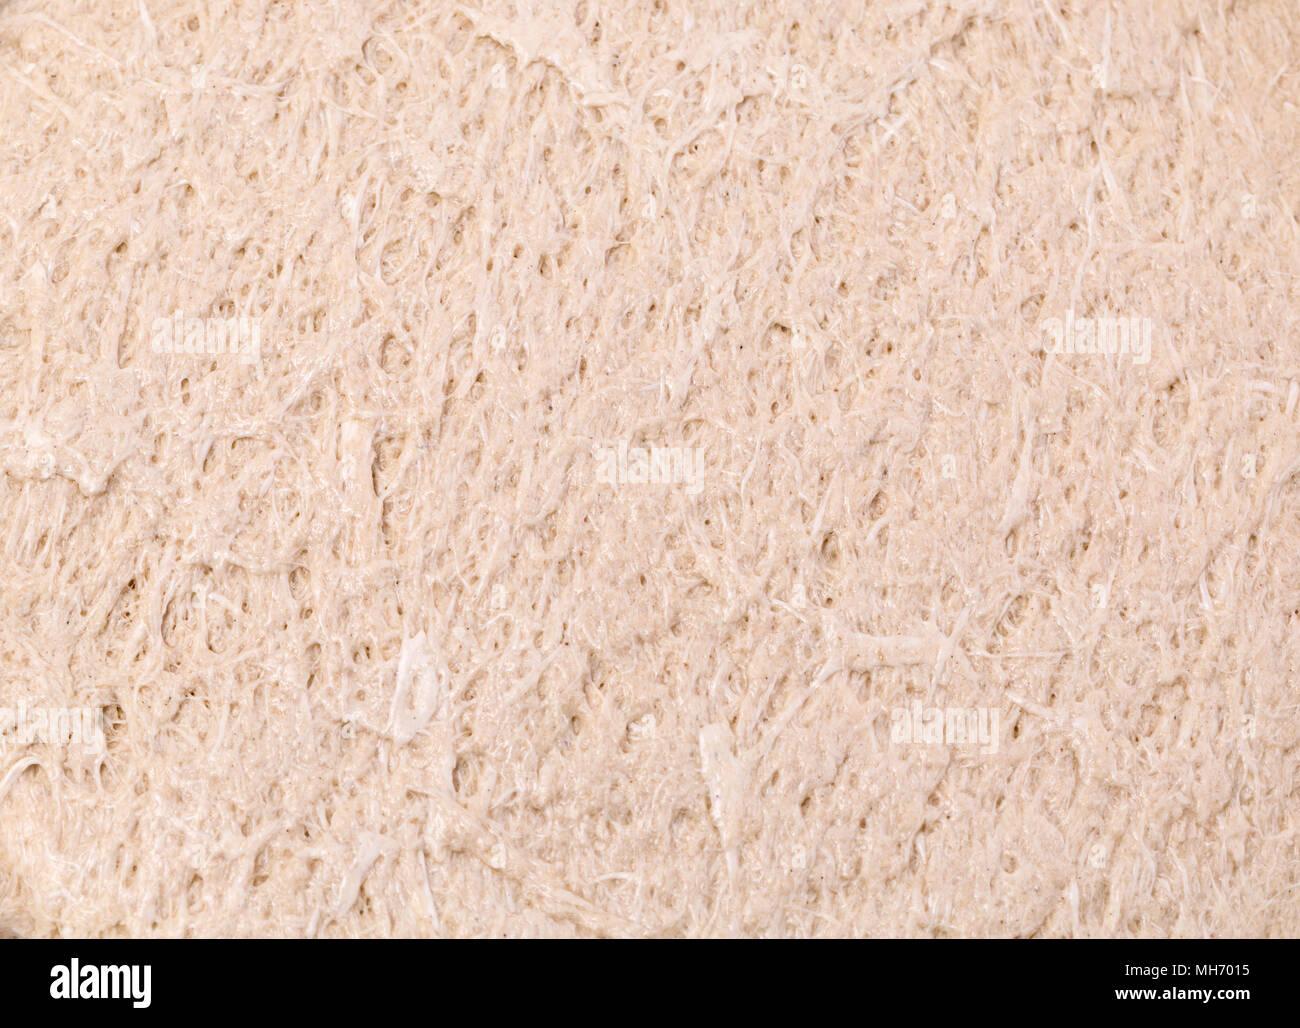 Halva  made from sesame seeds background closeup - Stock Image